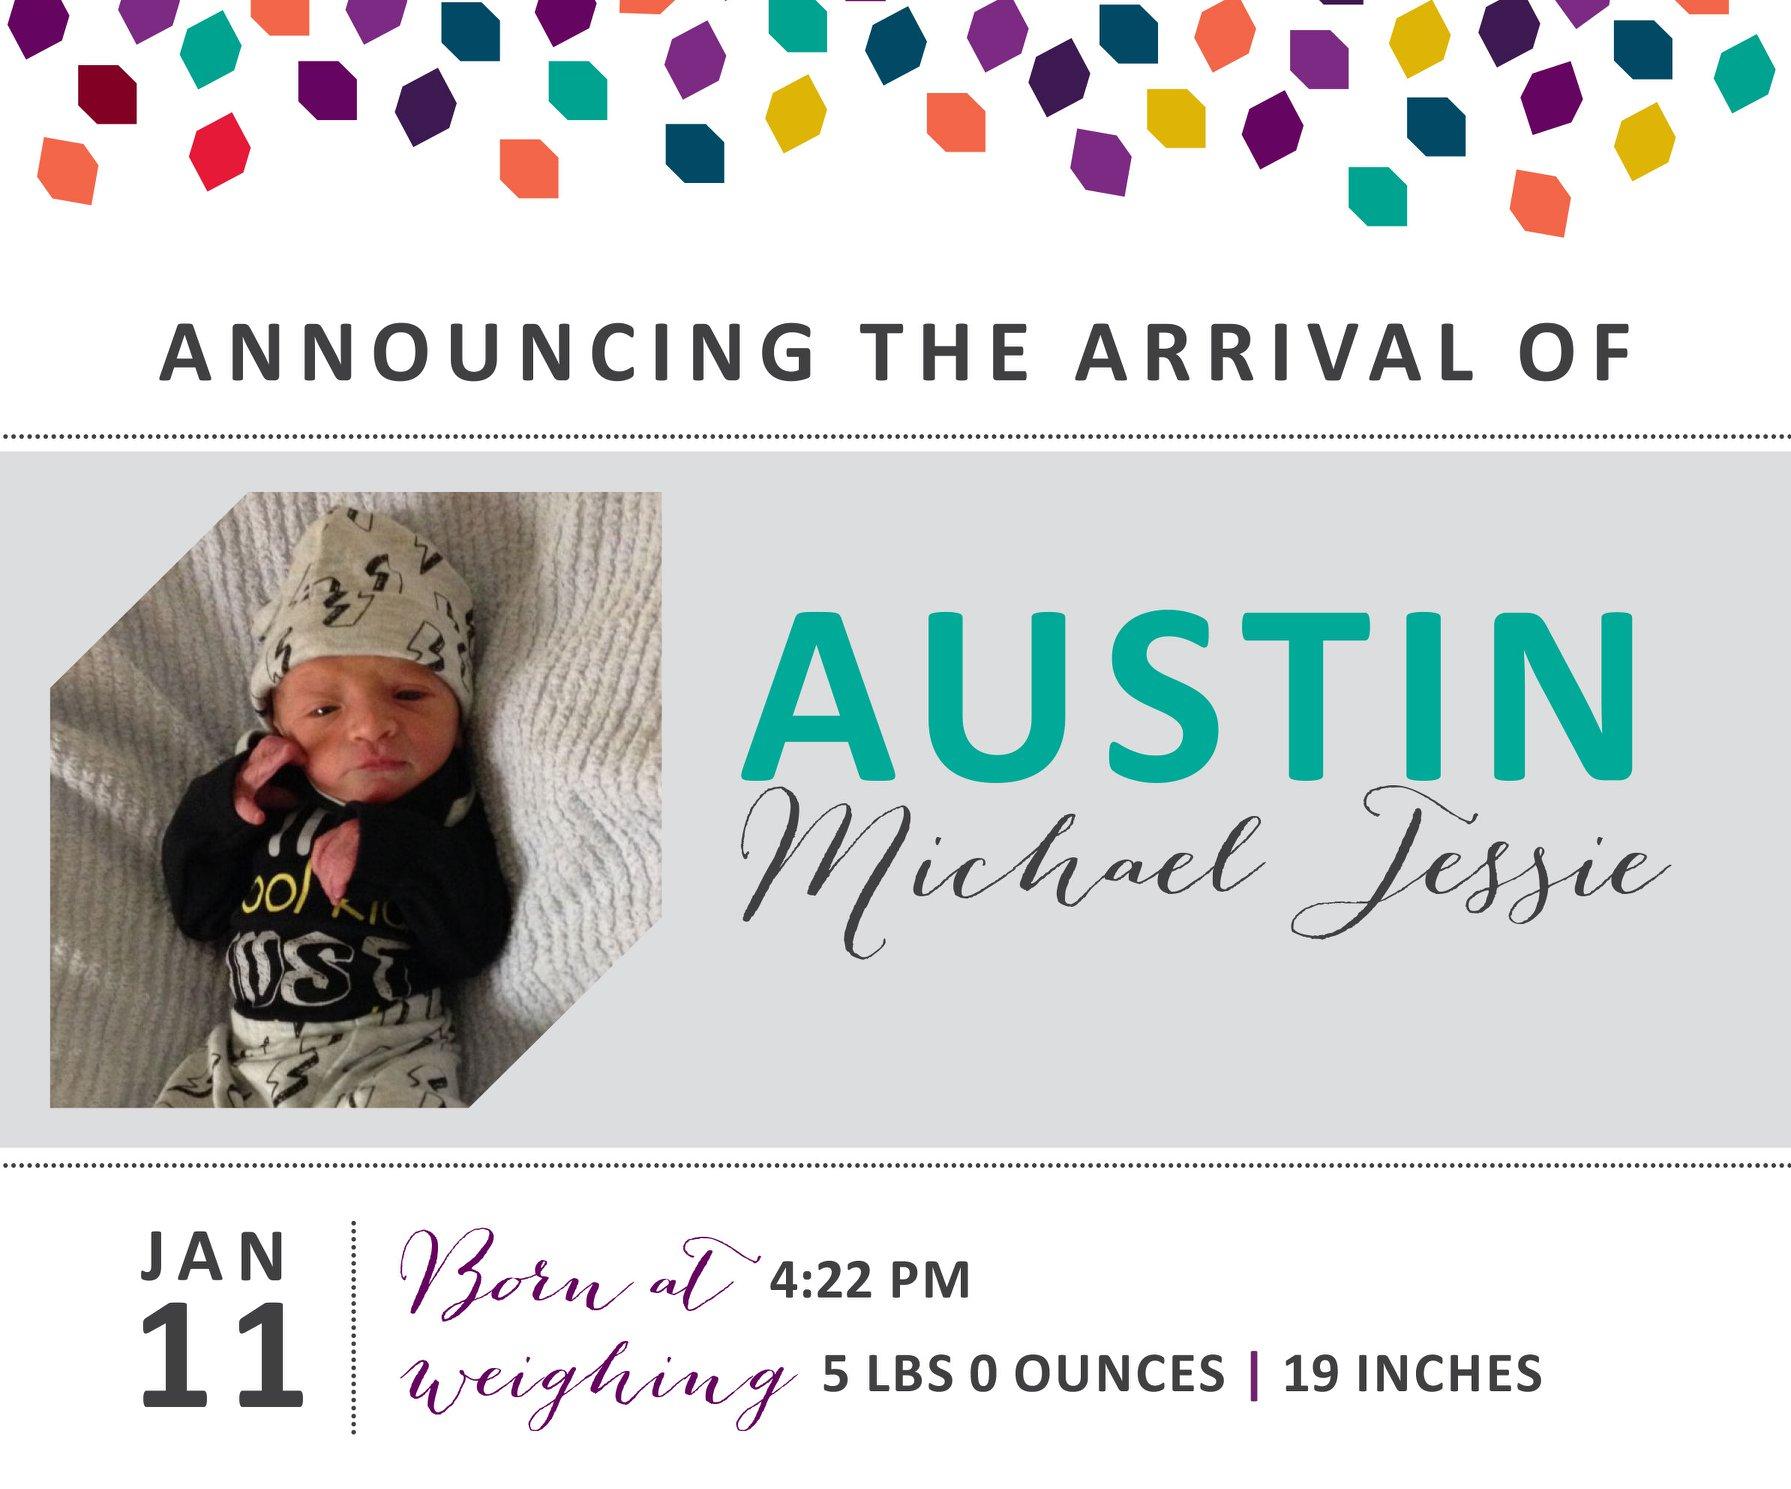 Austin Michael Jessie 1